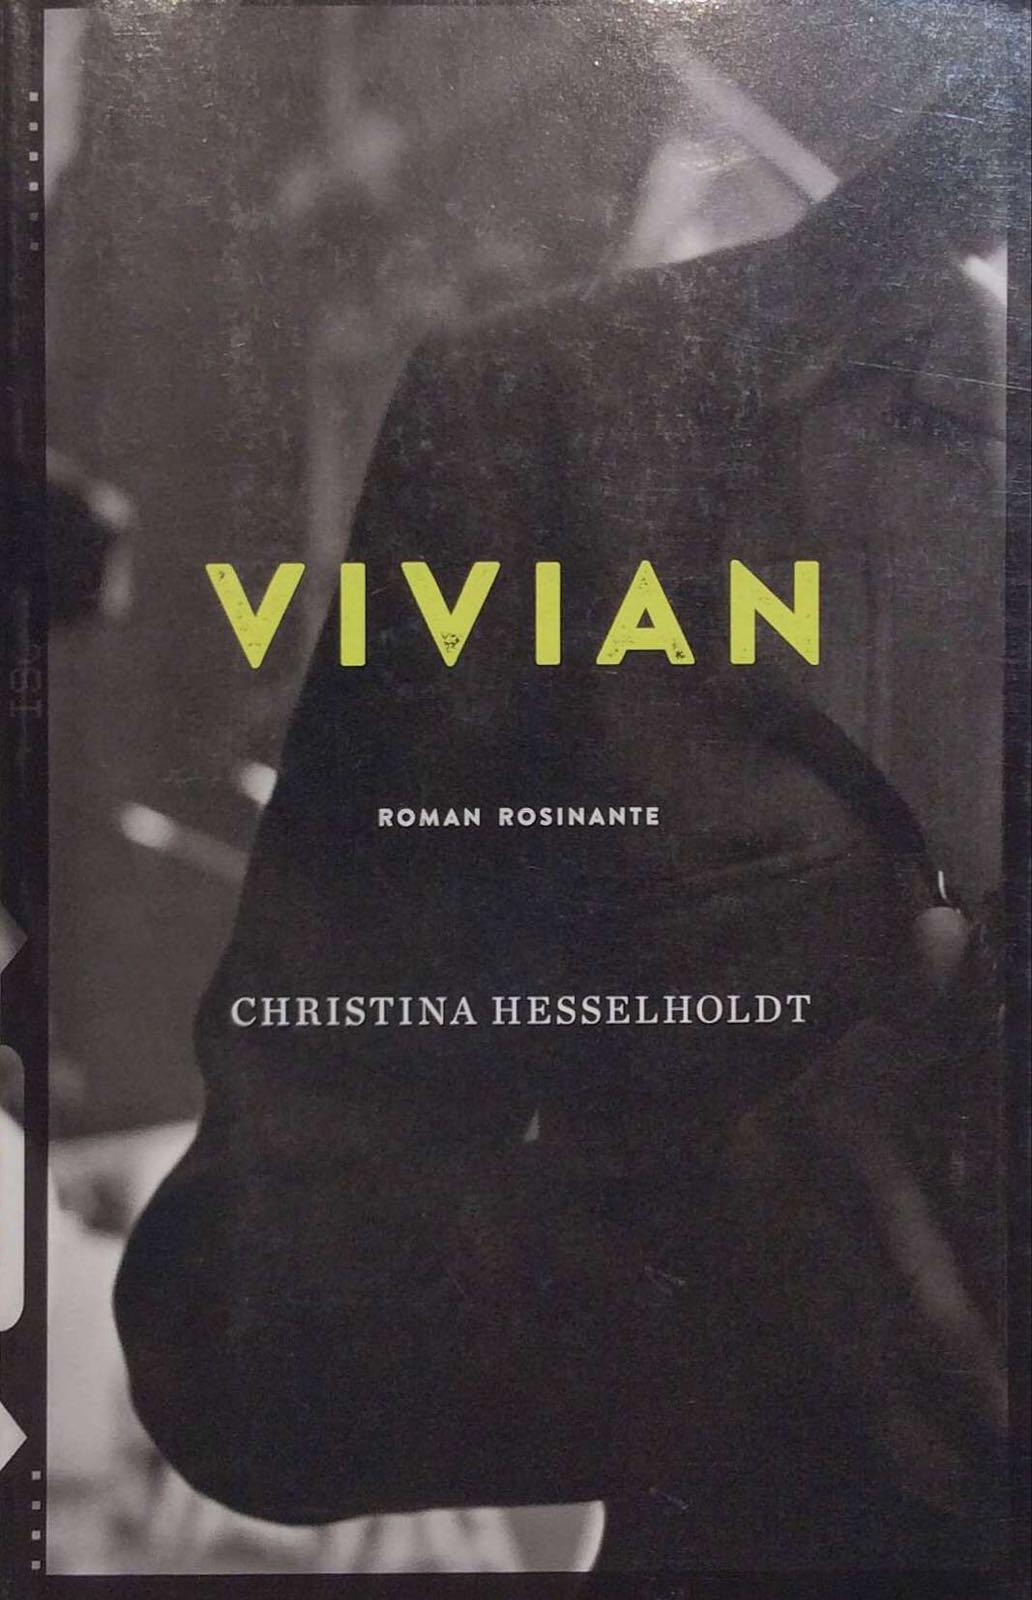 Hesselholdt, Christina. Vivian